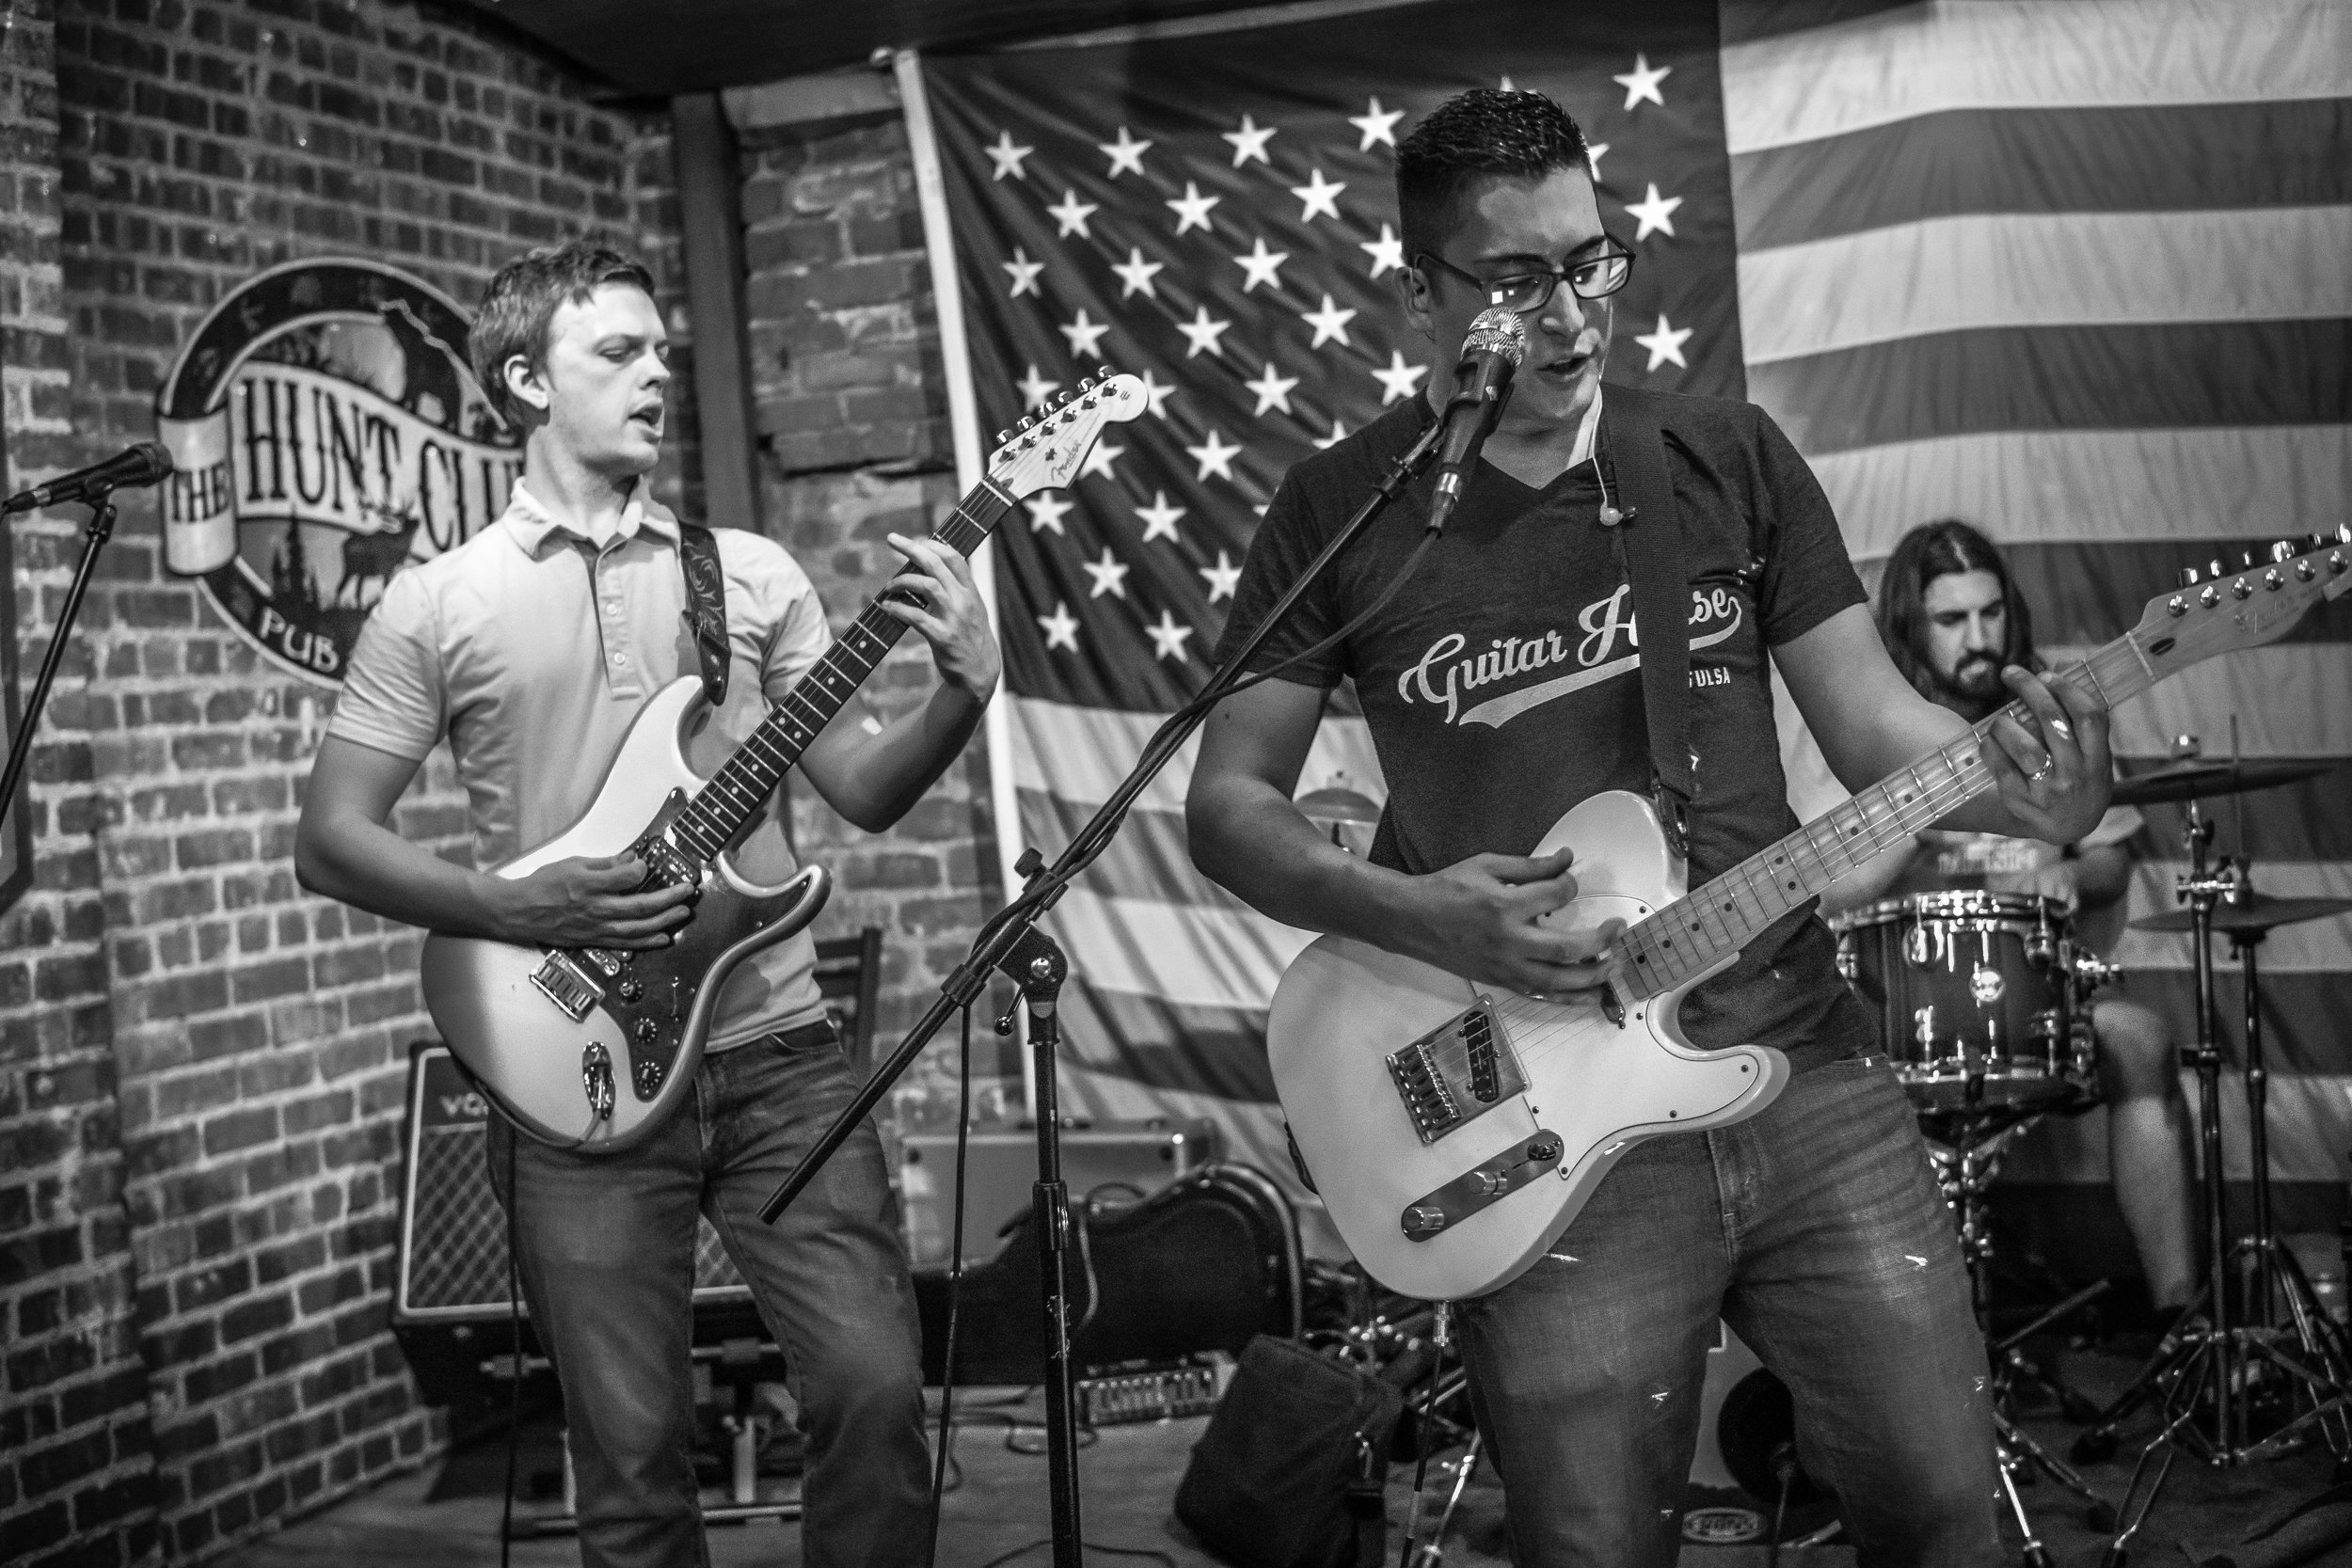 FM Pilots - Tulsa Rock Band - The Hunt Club Tulsa, OK 061016-12.jpg